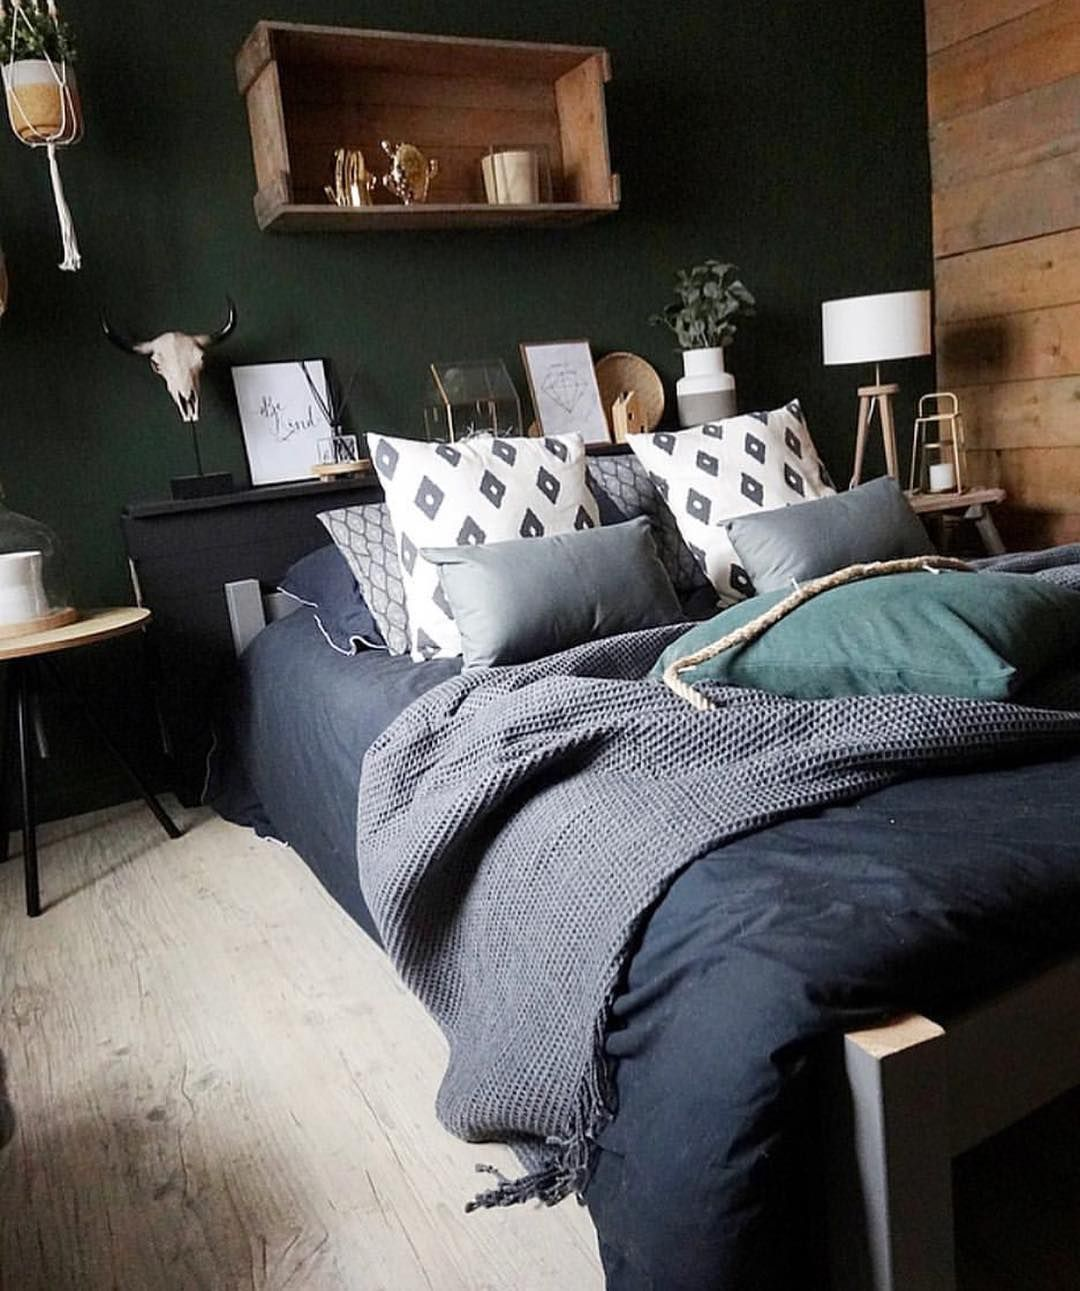 ️Adult Room 😍  Inspi @coconuts_deco  #instagood #instalike #likephoto #picoftheday #room #roomdecor #adultroom #bedroom #bedroomdecor